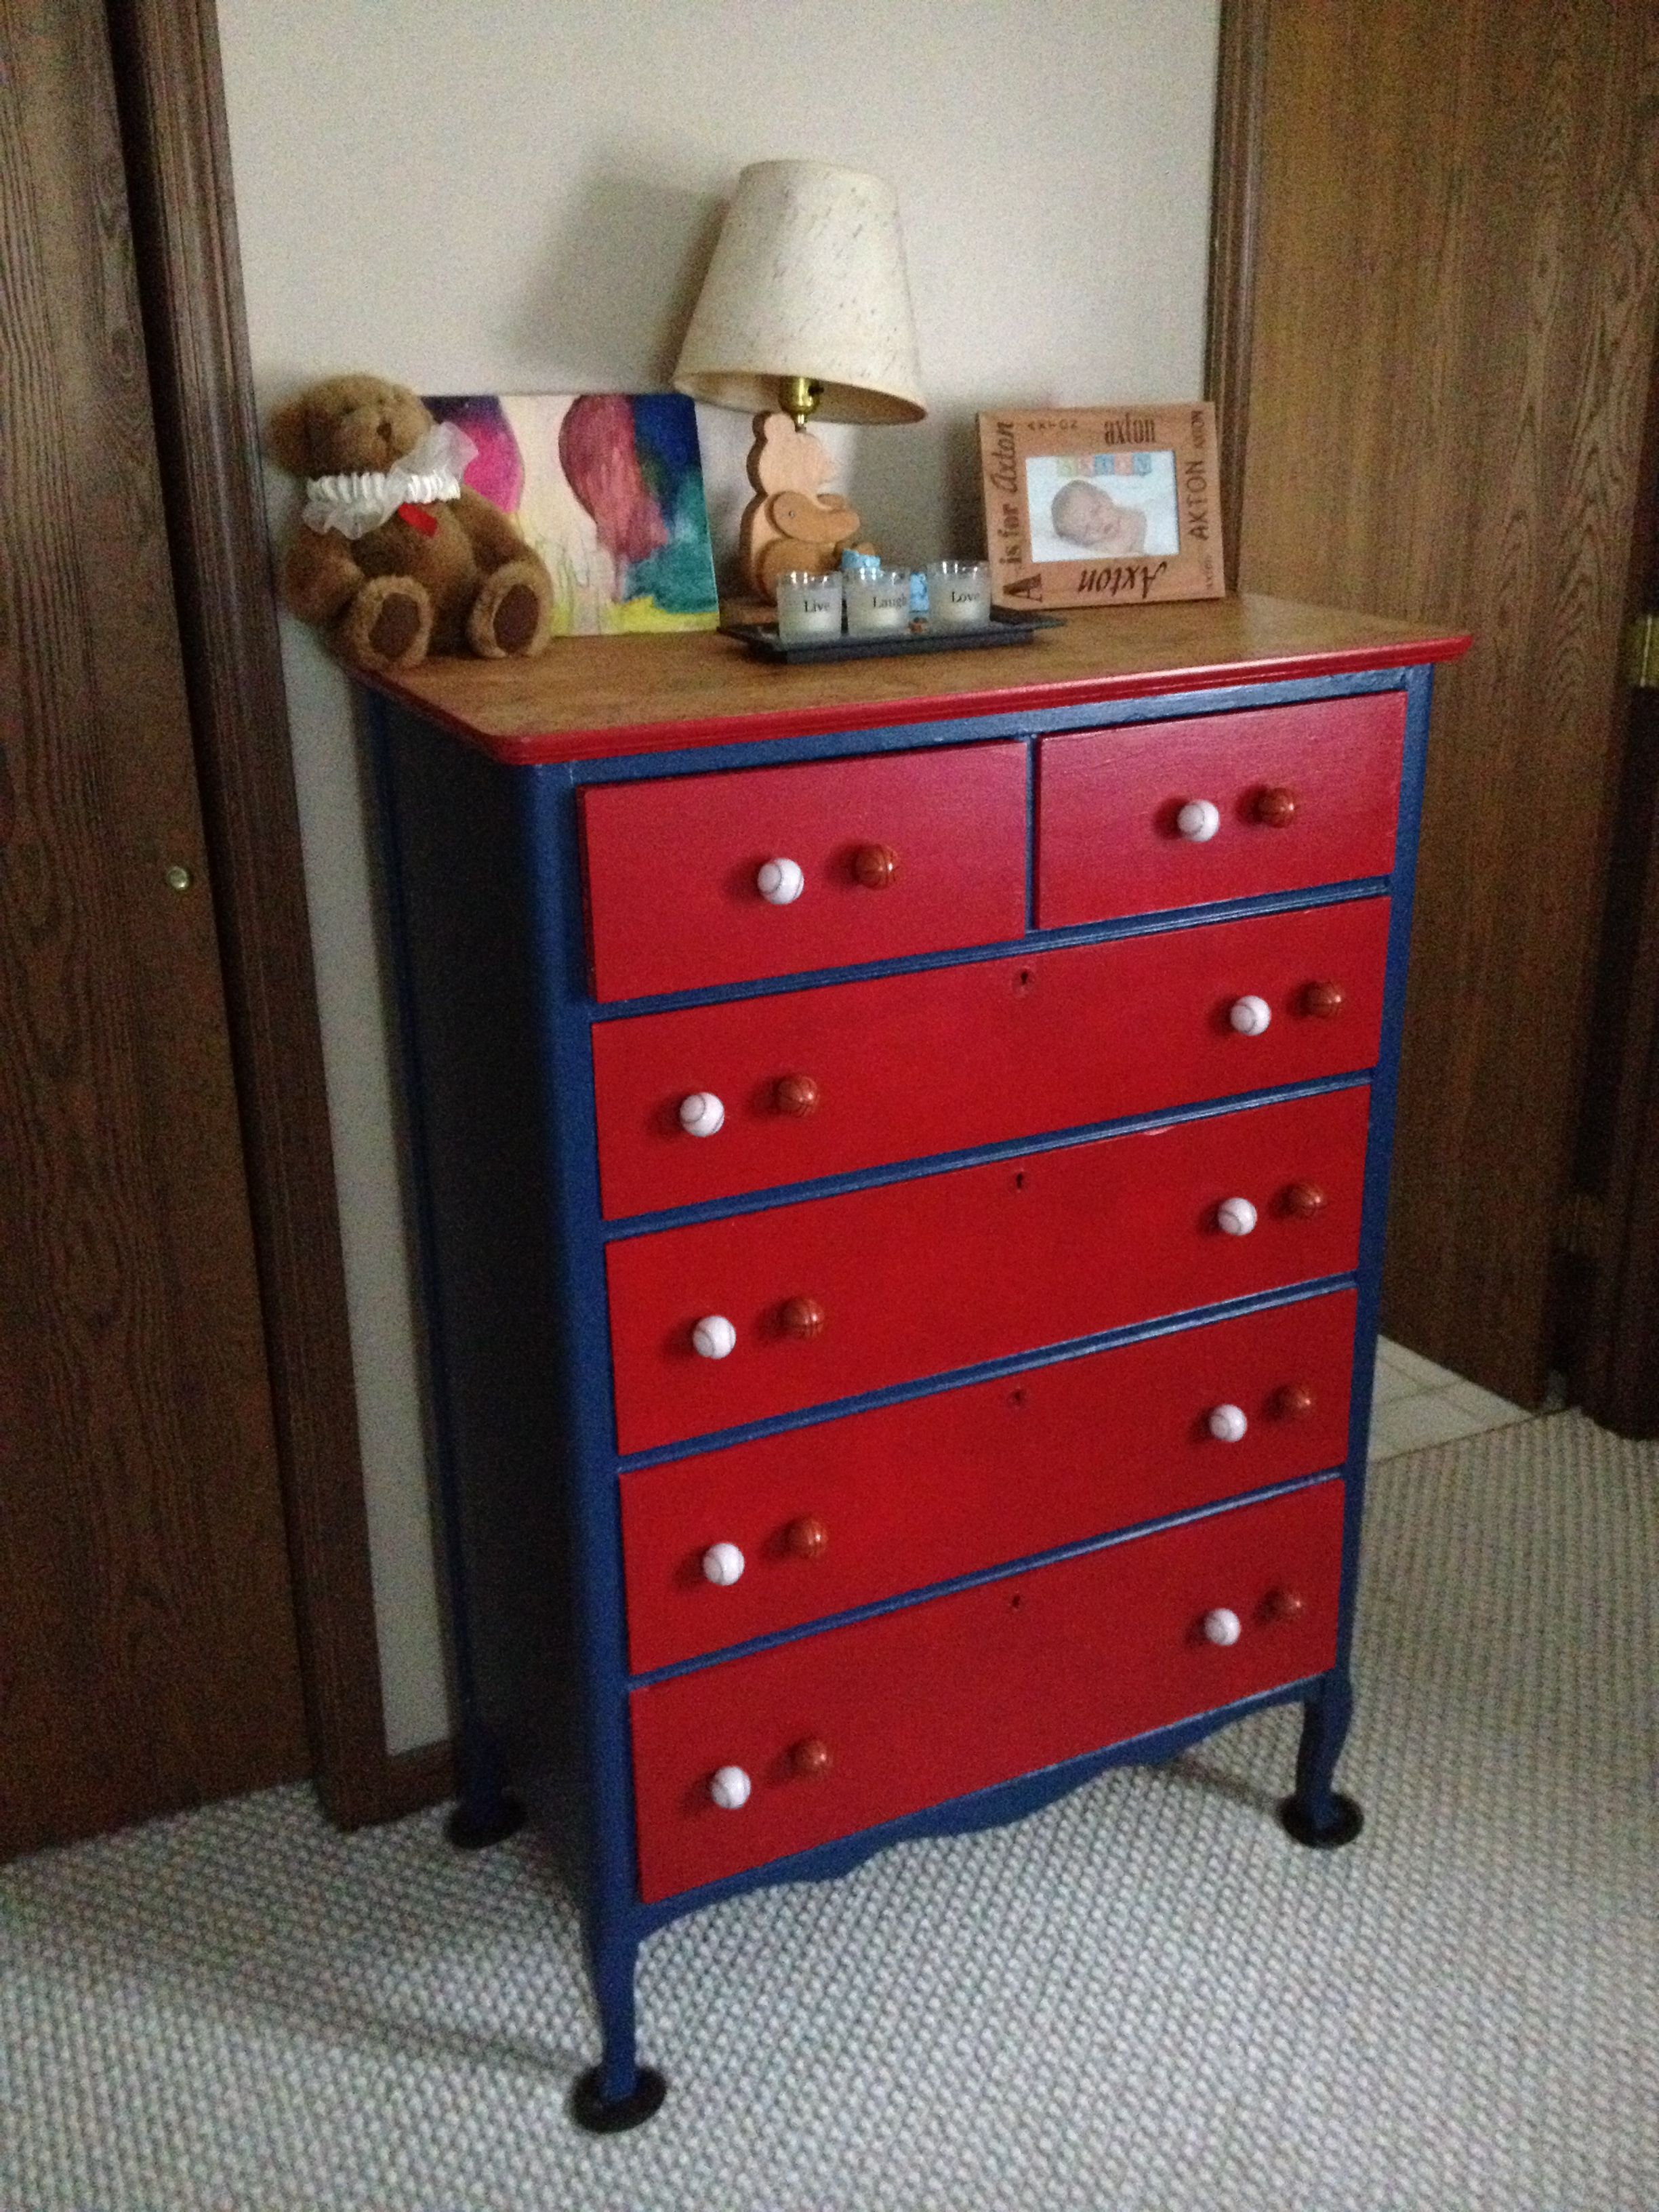 Refinished Dresser For A Sports Themed Bedroom Dresser Refinish